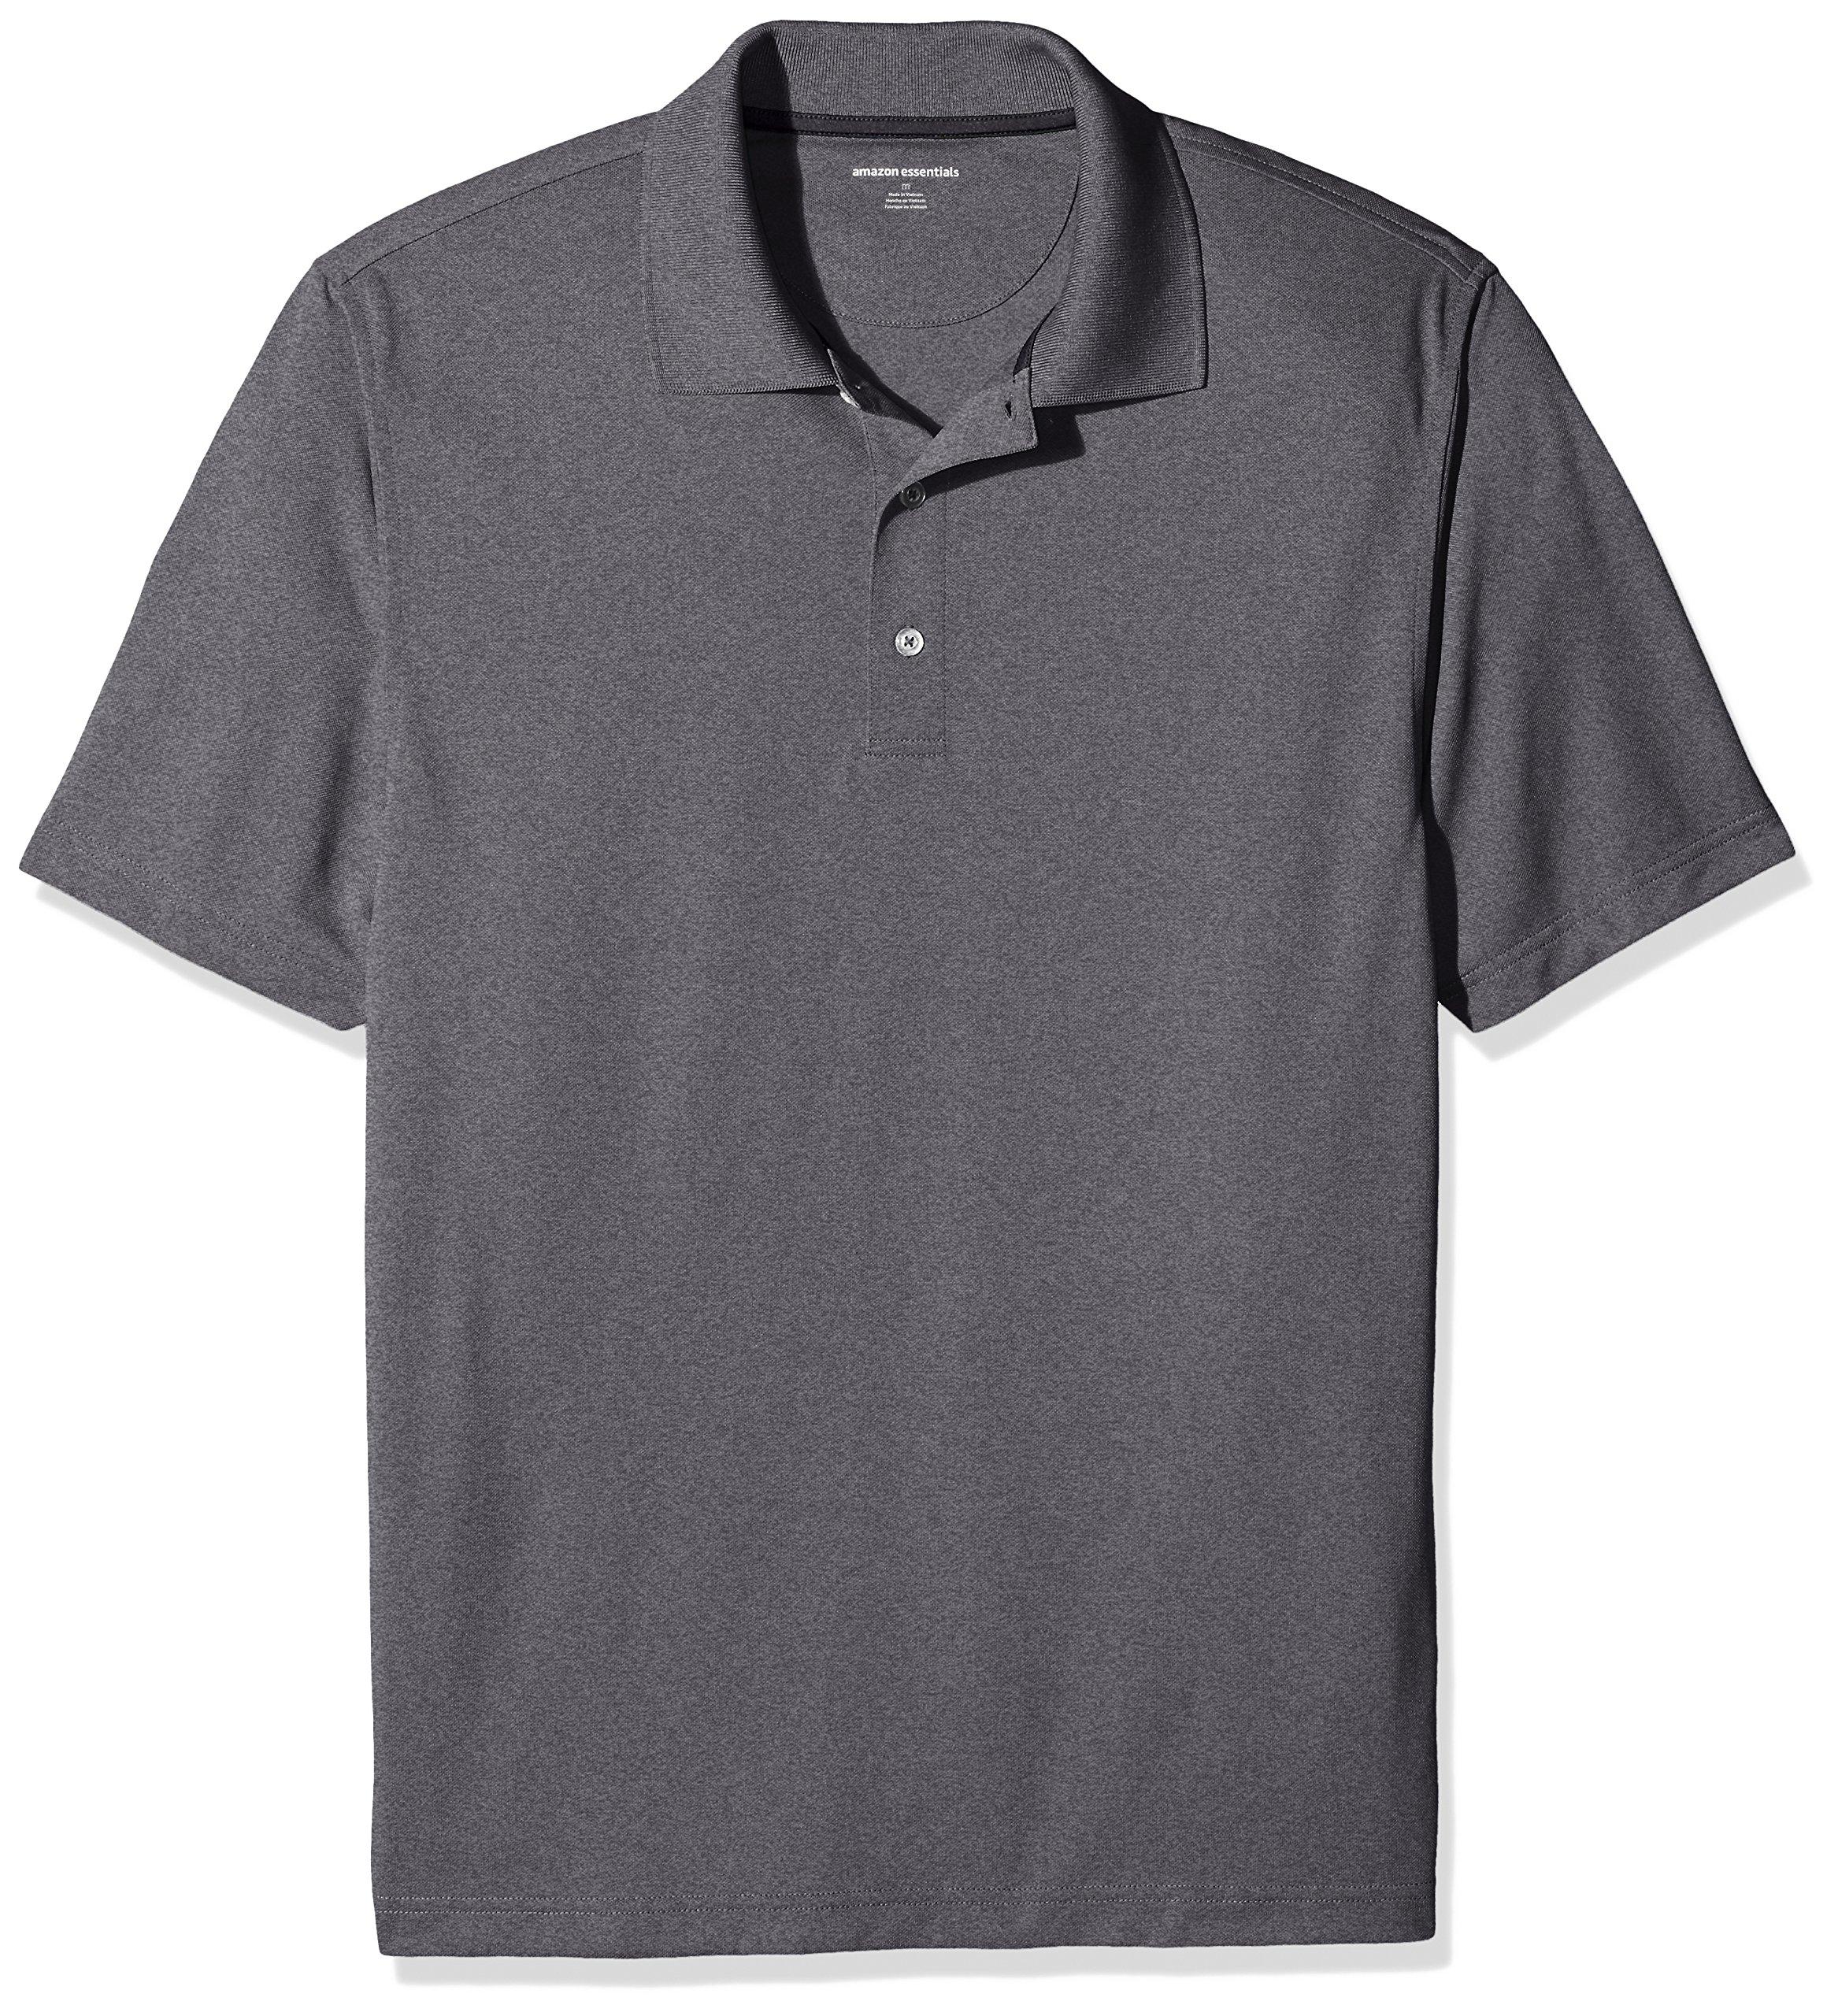 Amazon Essentials Men's Regular-Fit Quick-Dry Golf Polo Shirt, Medium Heather Grey, X-Small by Amazon Essentials